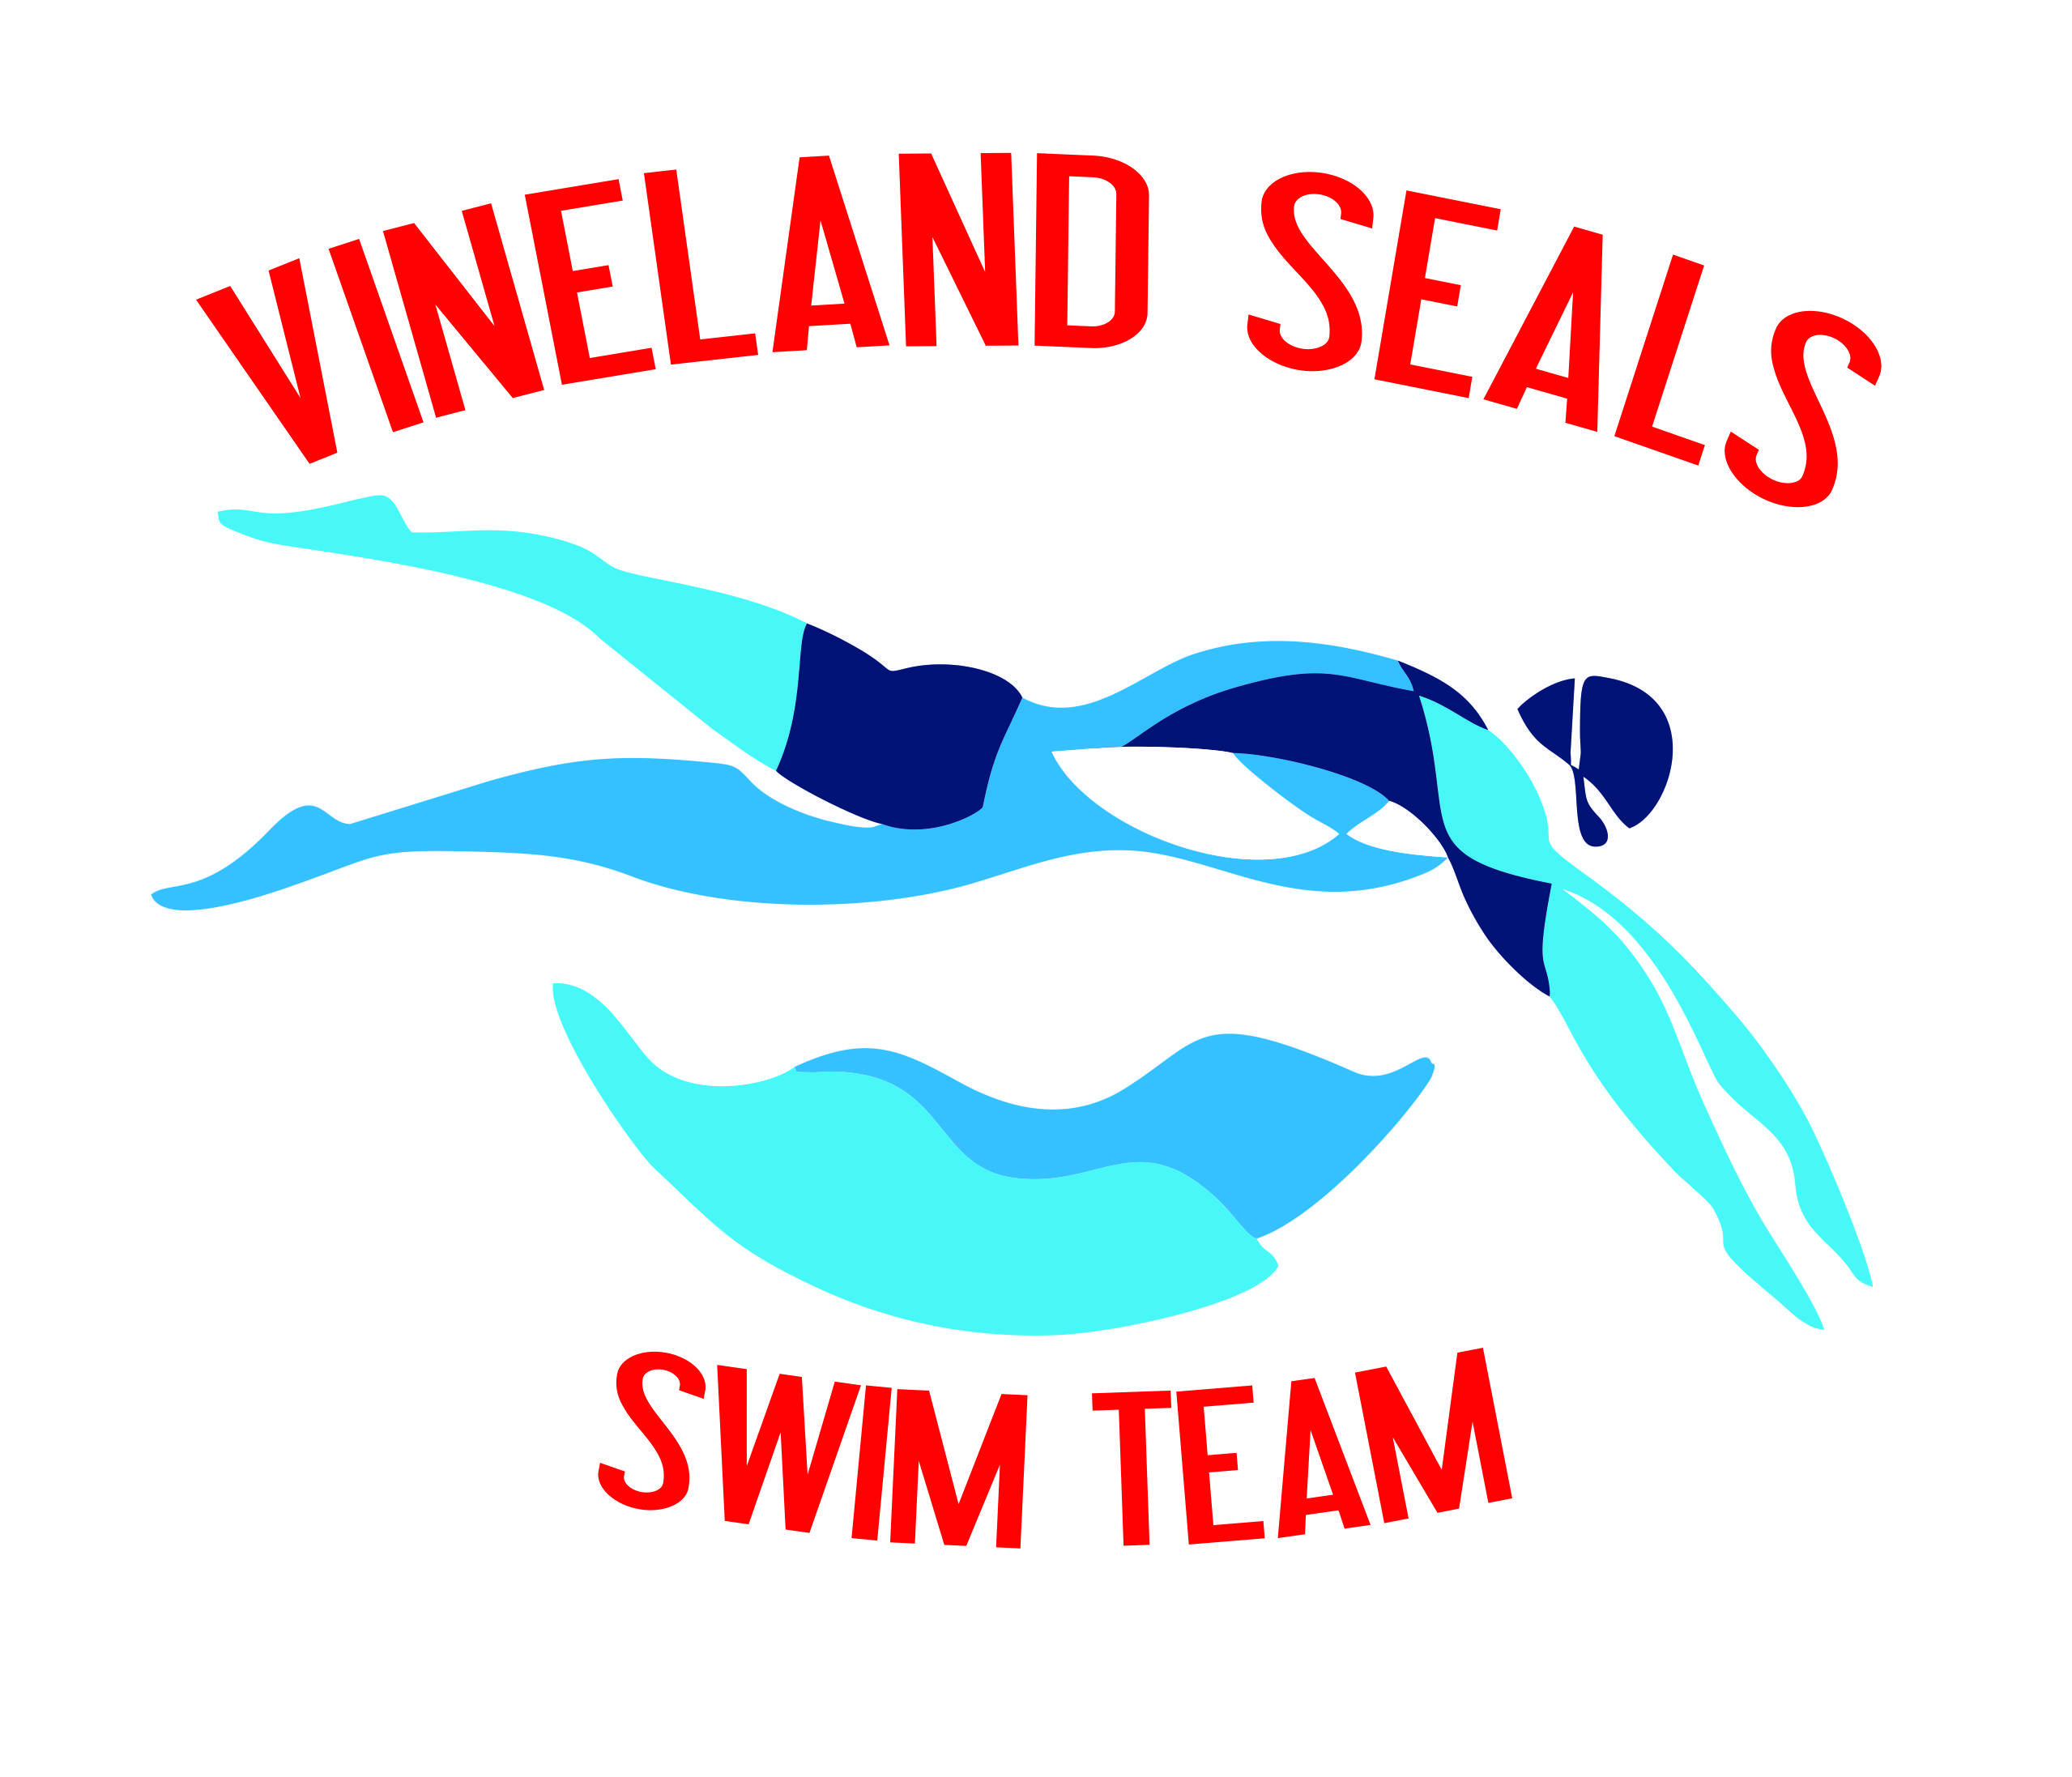 Programs cumberland cape atlantic ymca click below to visit the seals swim team website xflitez Image collections